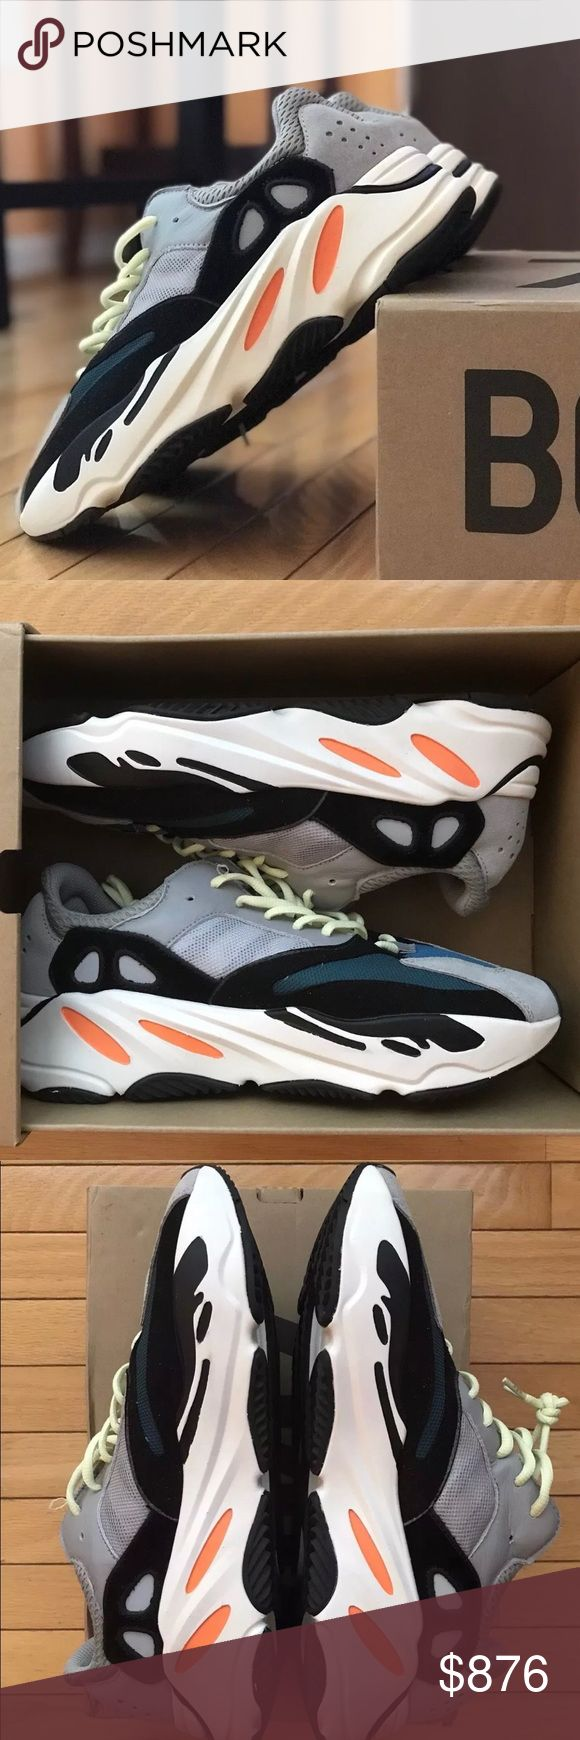 2017 NEW UA Adidas Yeezy Wave Runner 700 B75571